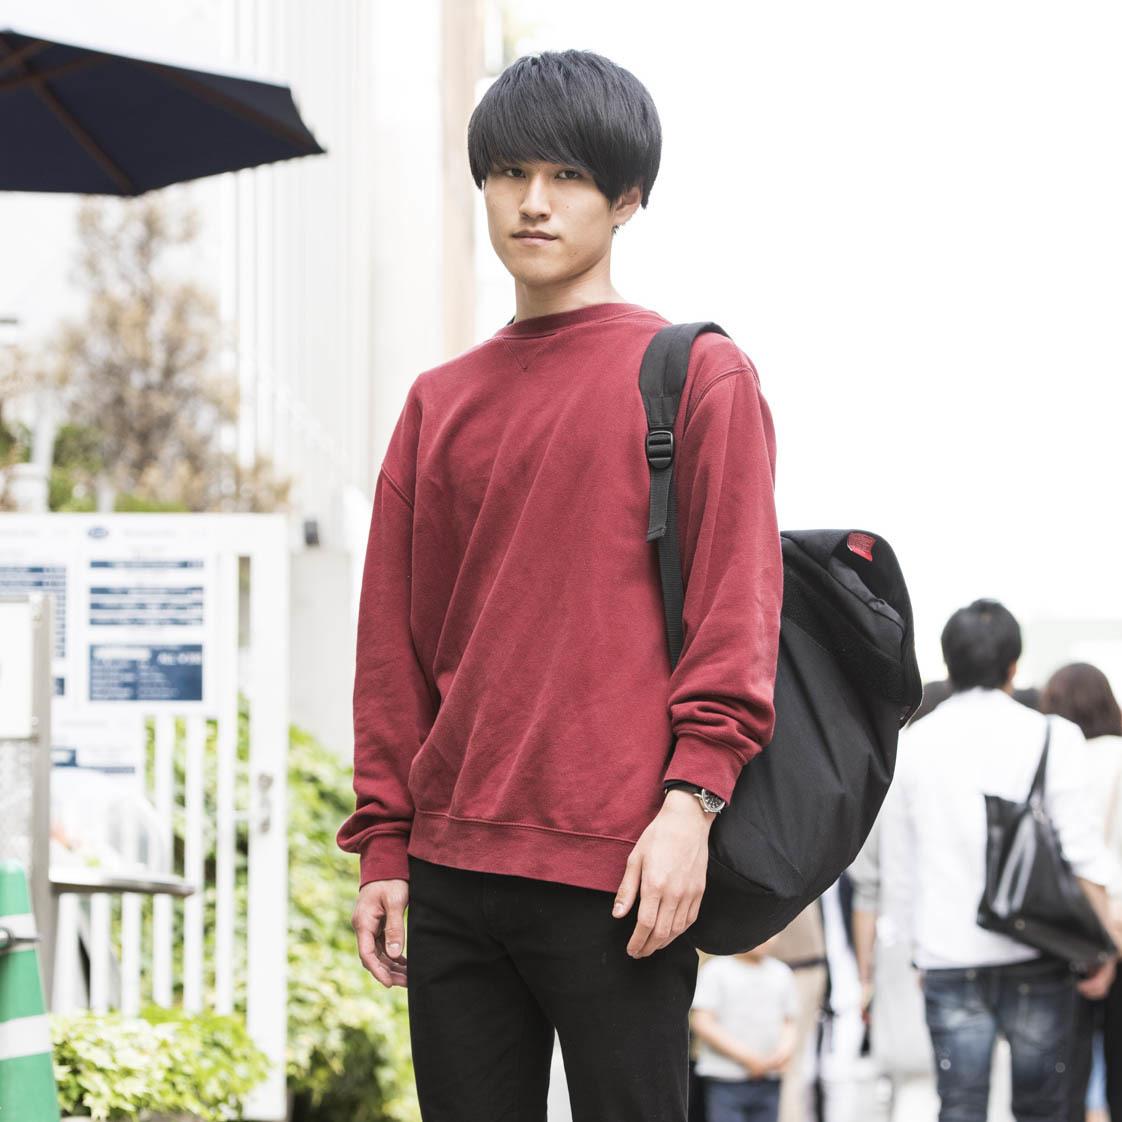 【SNAP JACK】ファッションはシルエットが9割 小澤高帆くん・高校生